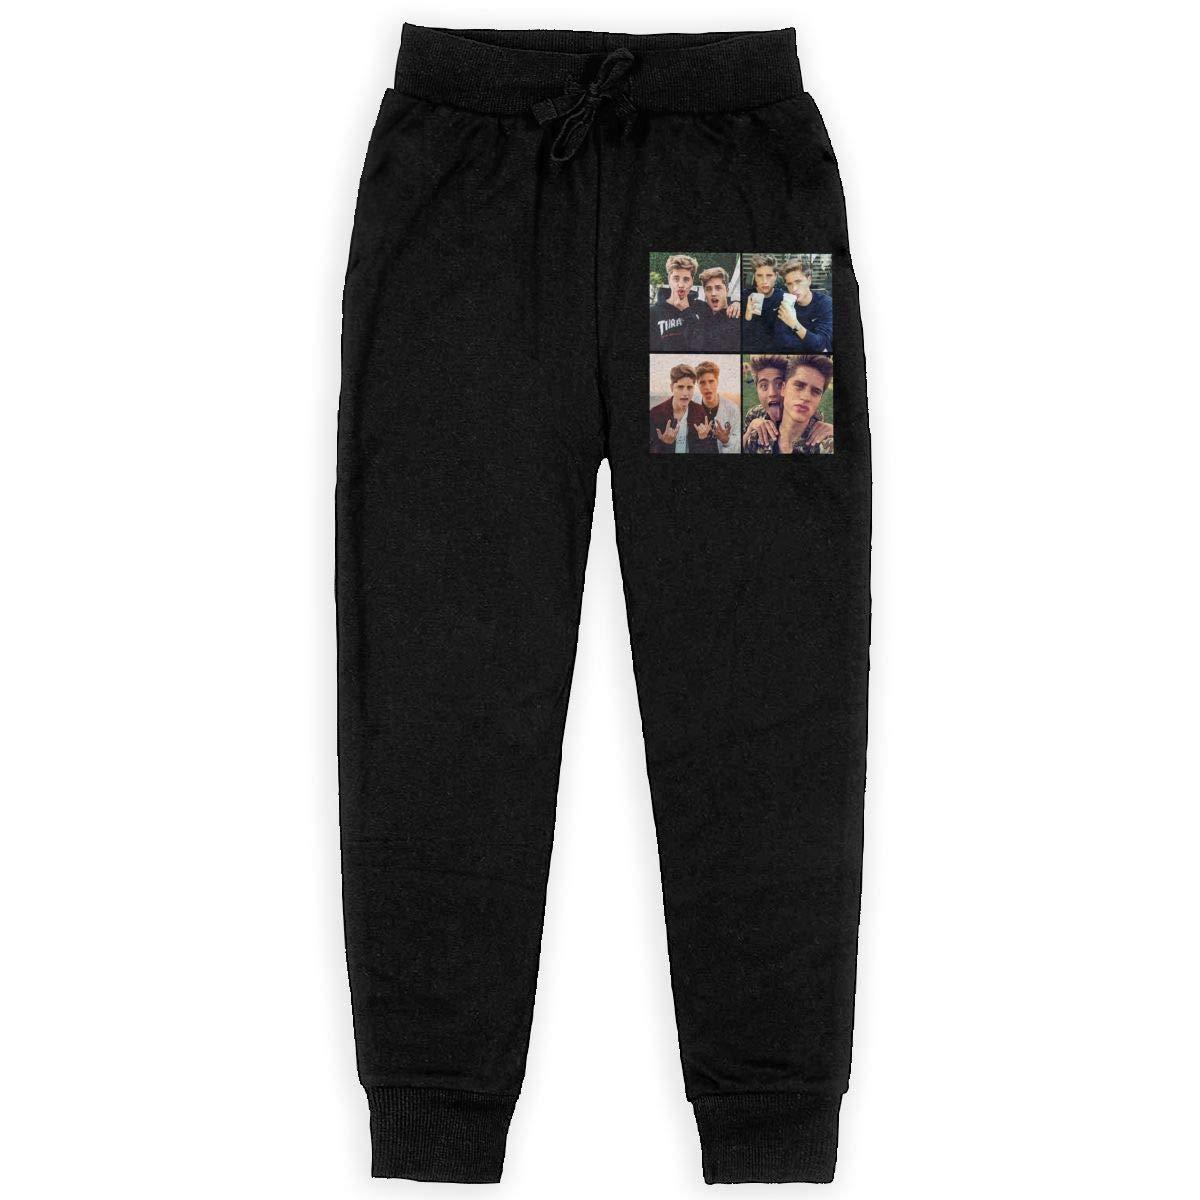 Big Boys Girls Casual Jogger Soft Training Pants Elastic Waist Martinez Twins Logo